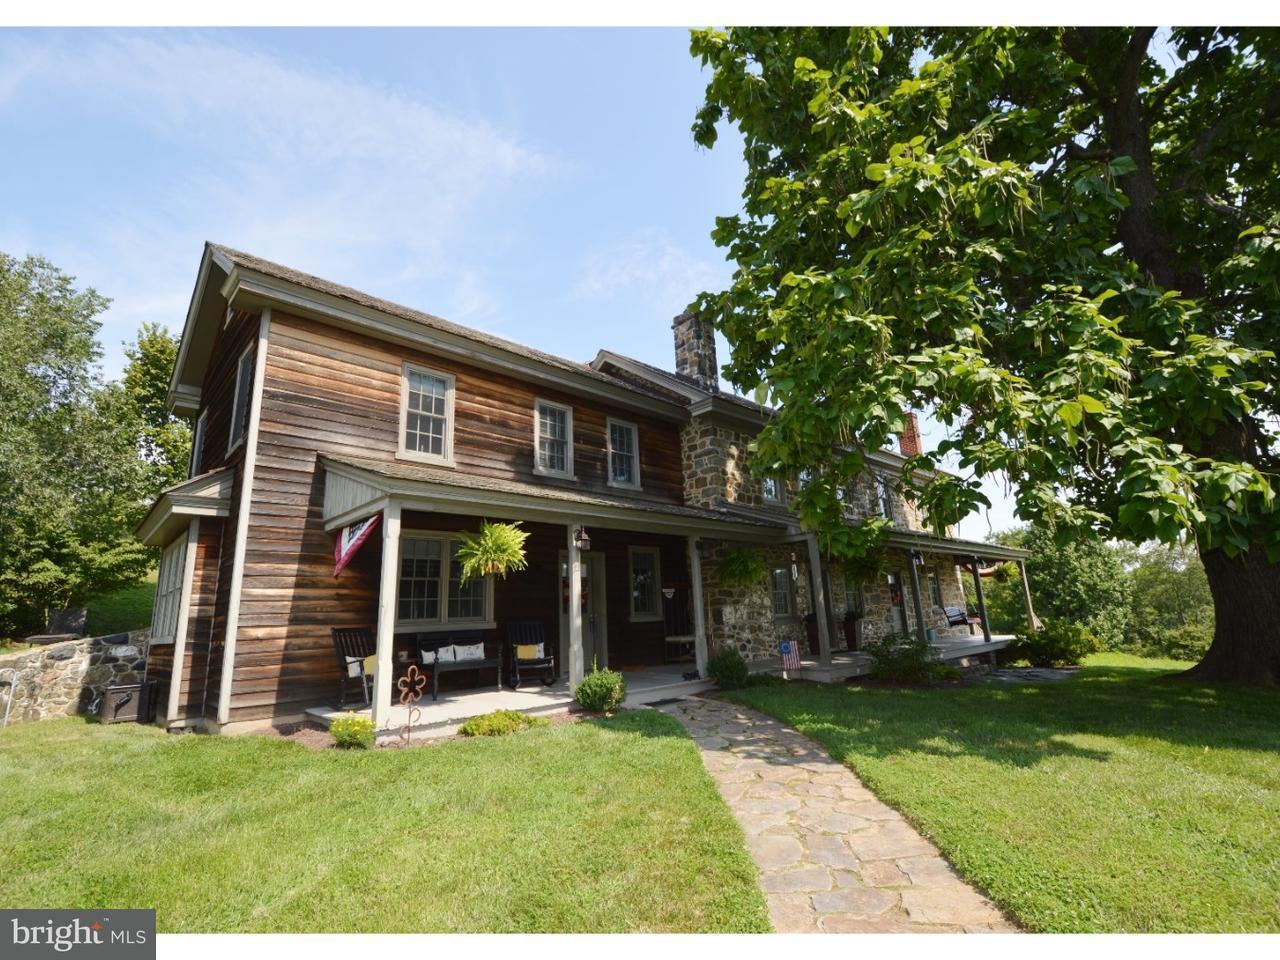 Single Family Home for Sale at 1427 ASHLAND CLINTON SCHOOL Road Hockessin, Delaware 19707 United States